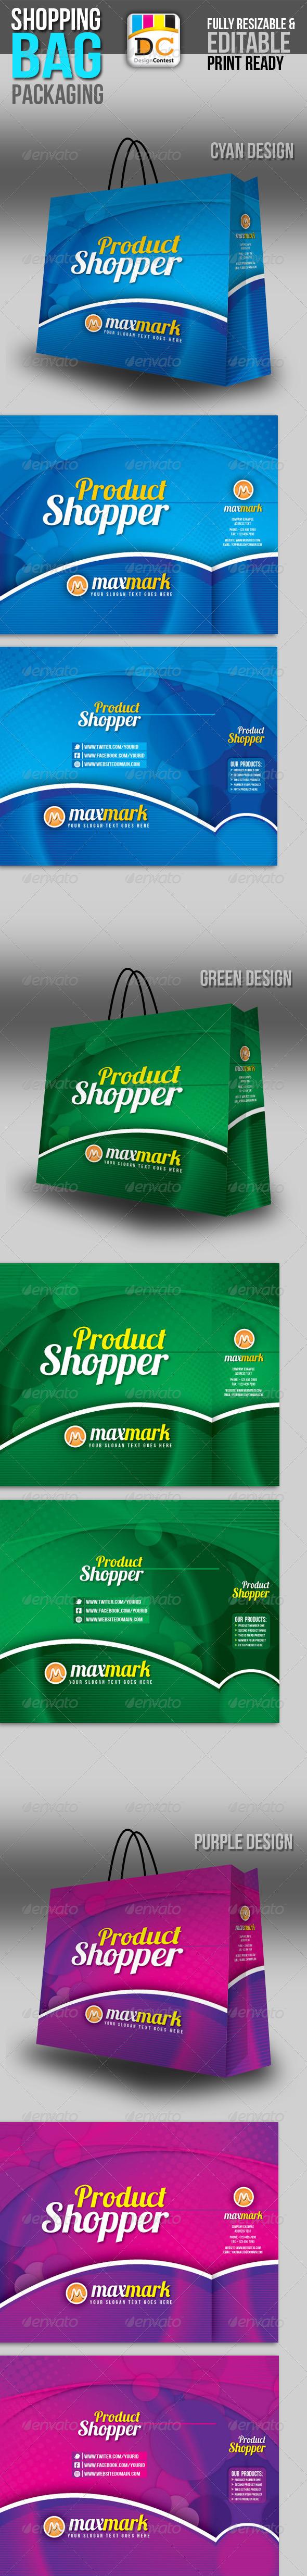 Max Mark Shopping Bag Packaging - Packaging Print Templates